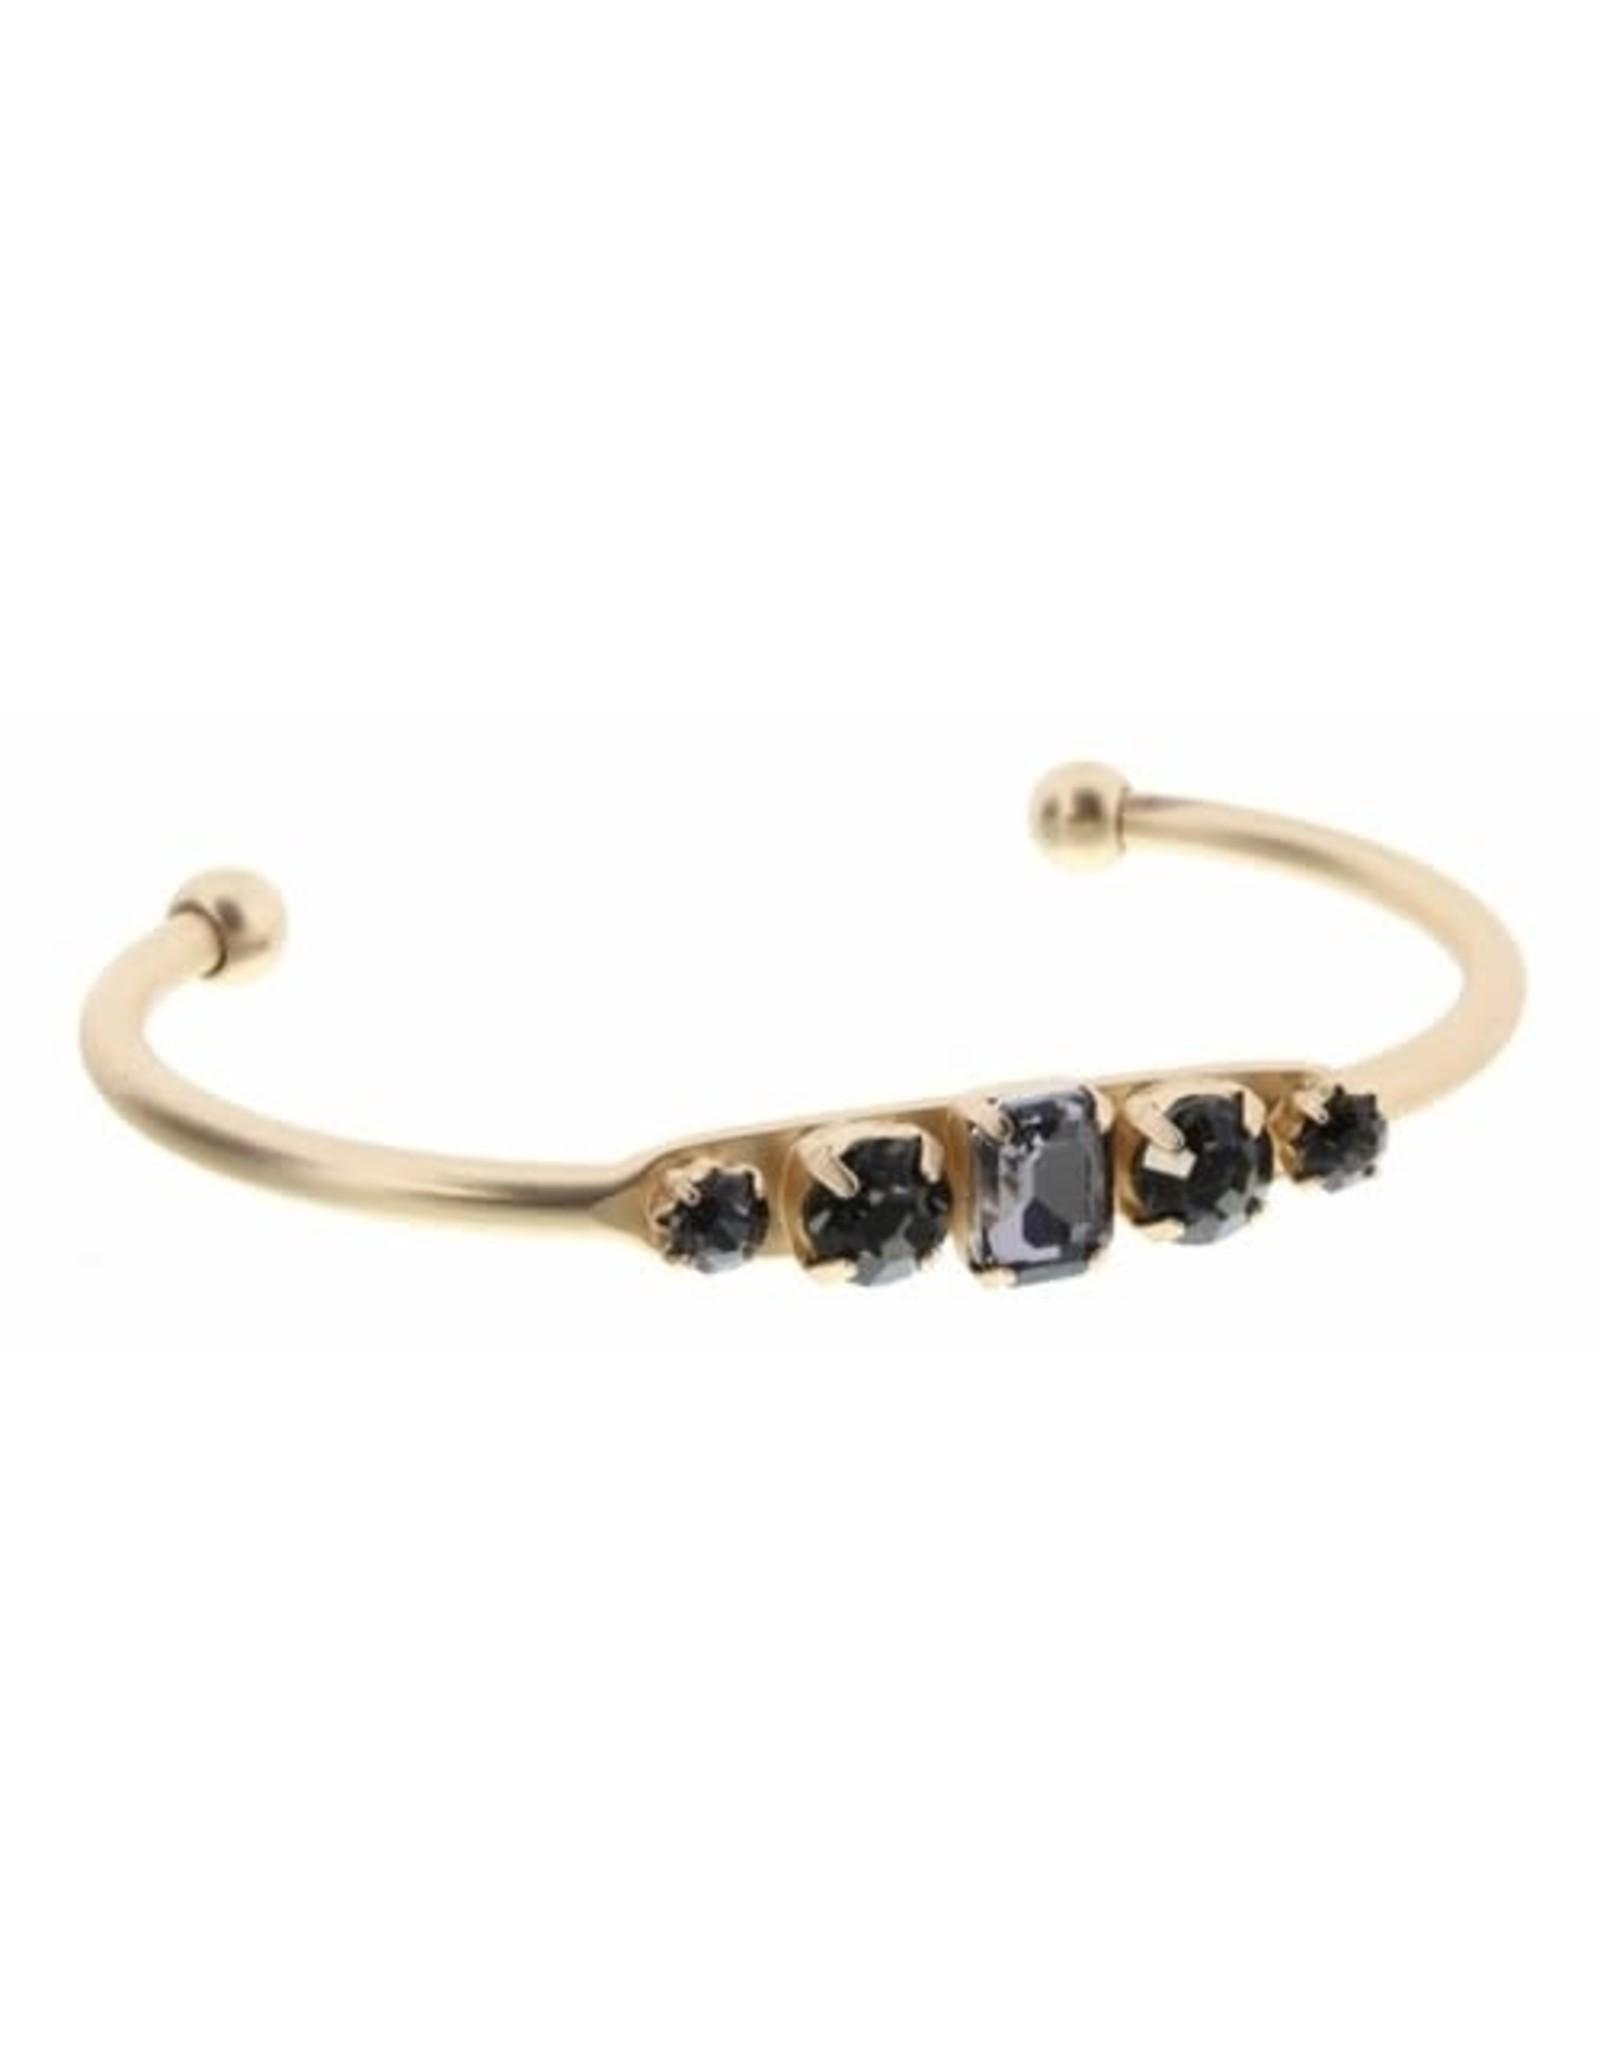 5 Smoke Crystals Bracelet